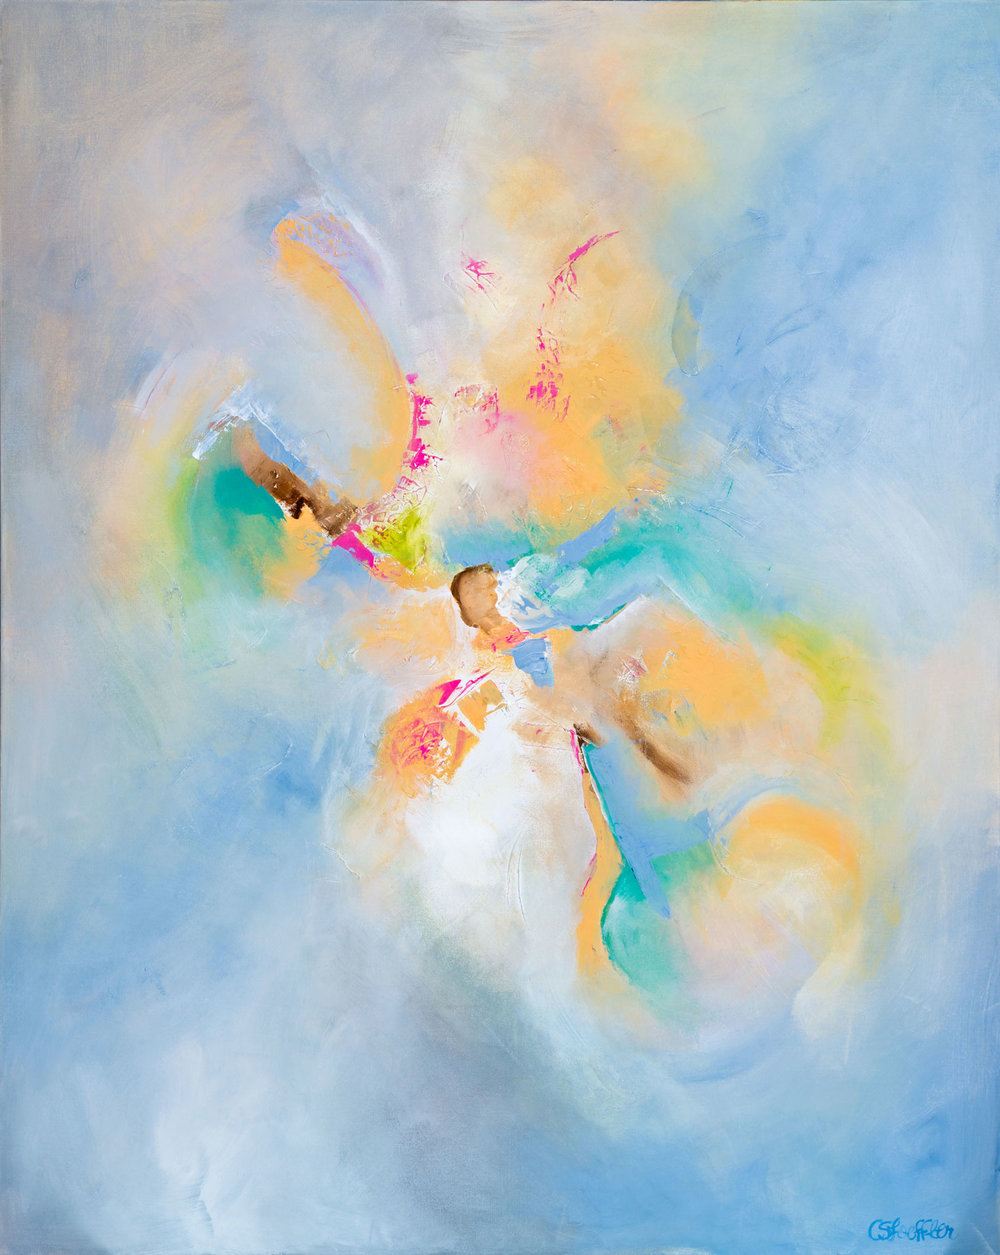 christine-loeffler-artwork-201703-a.jpg